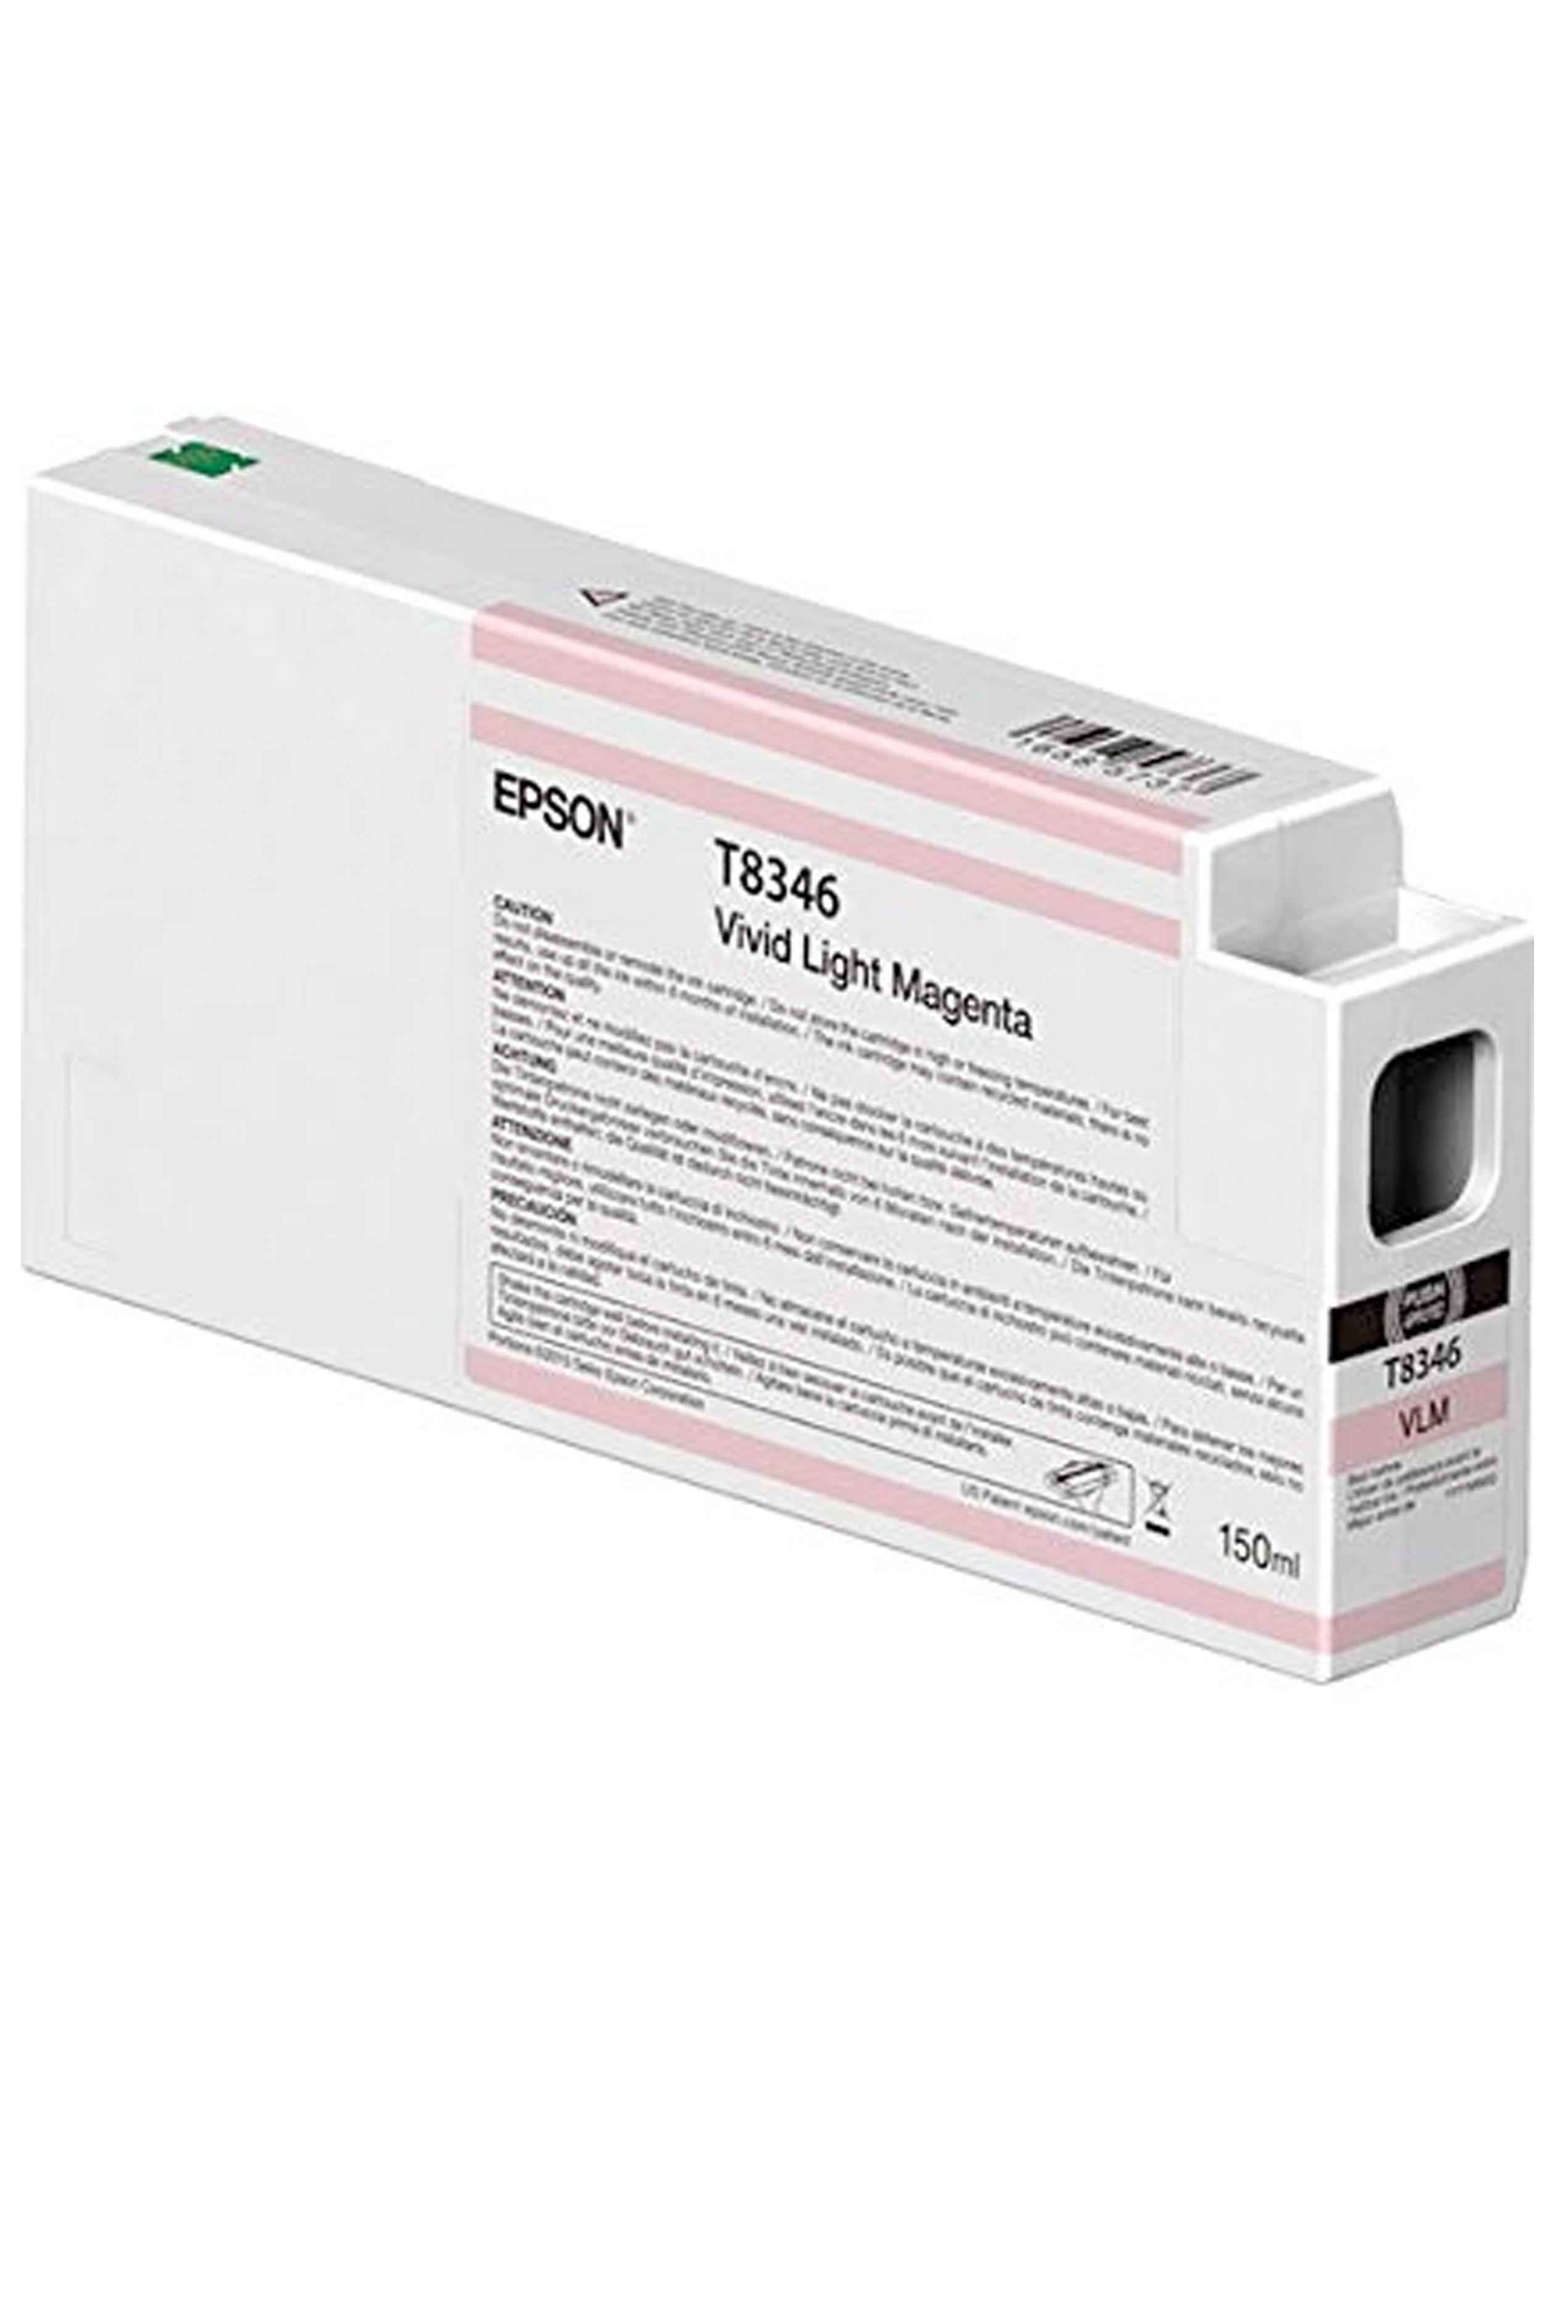 Epson EPSON SD LT MAGENTA INK (150 ML) (T834600)